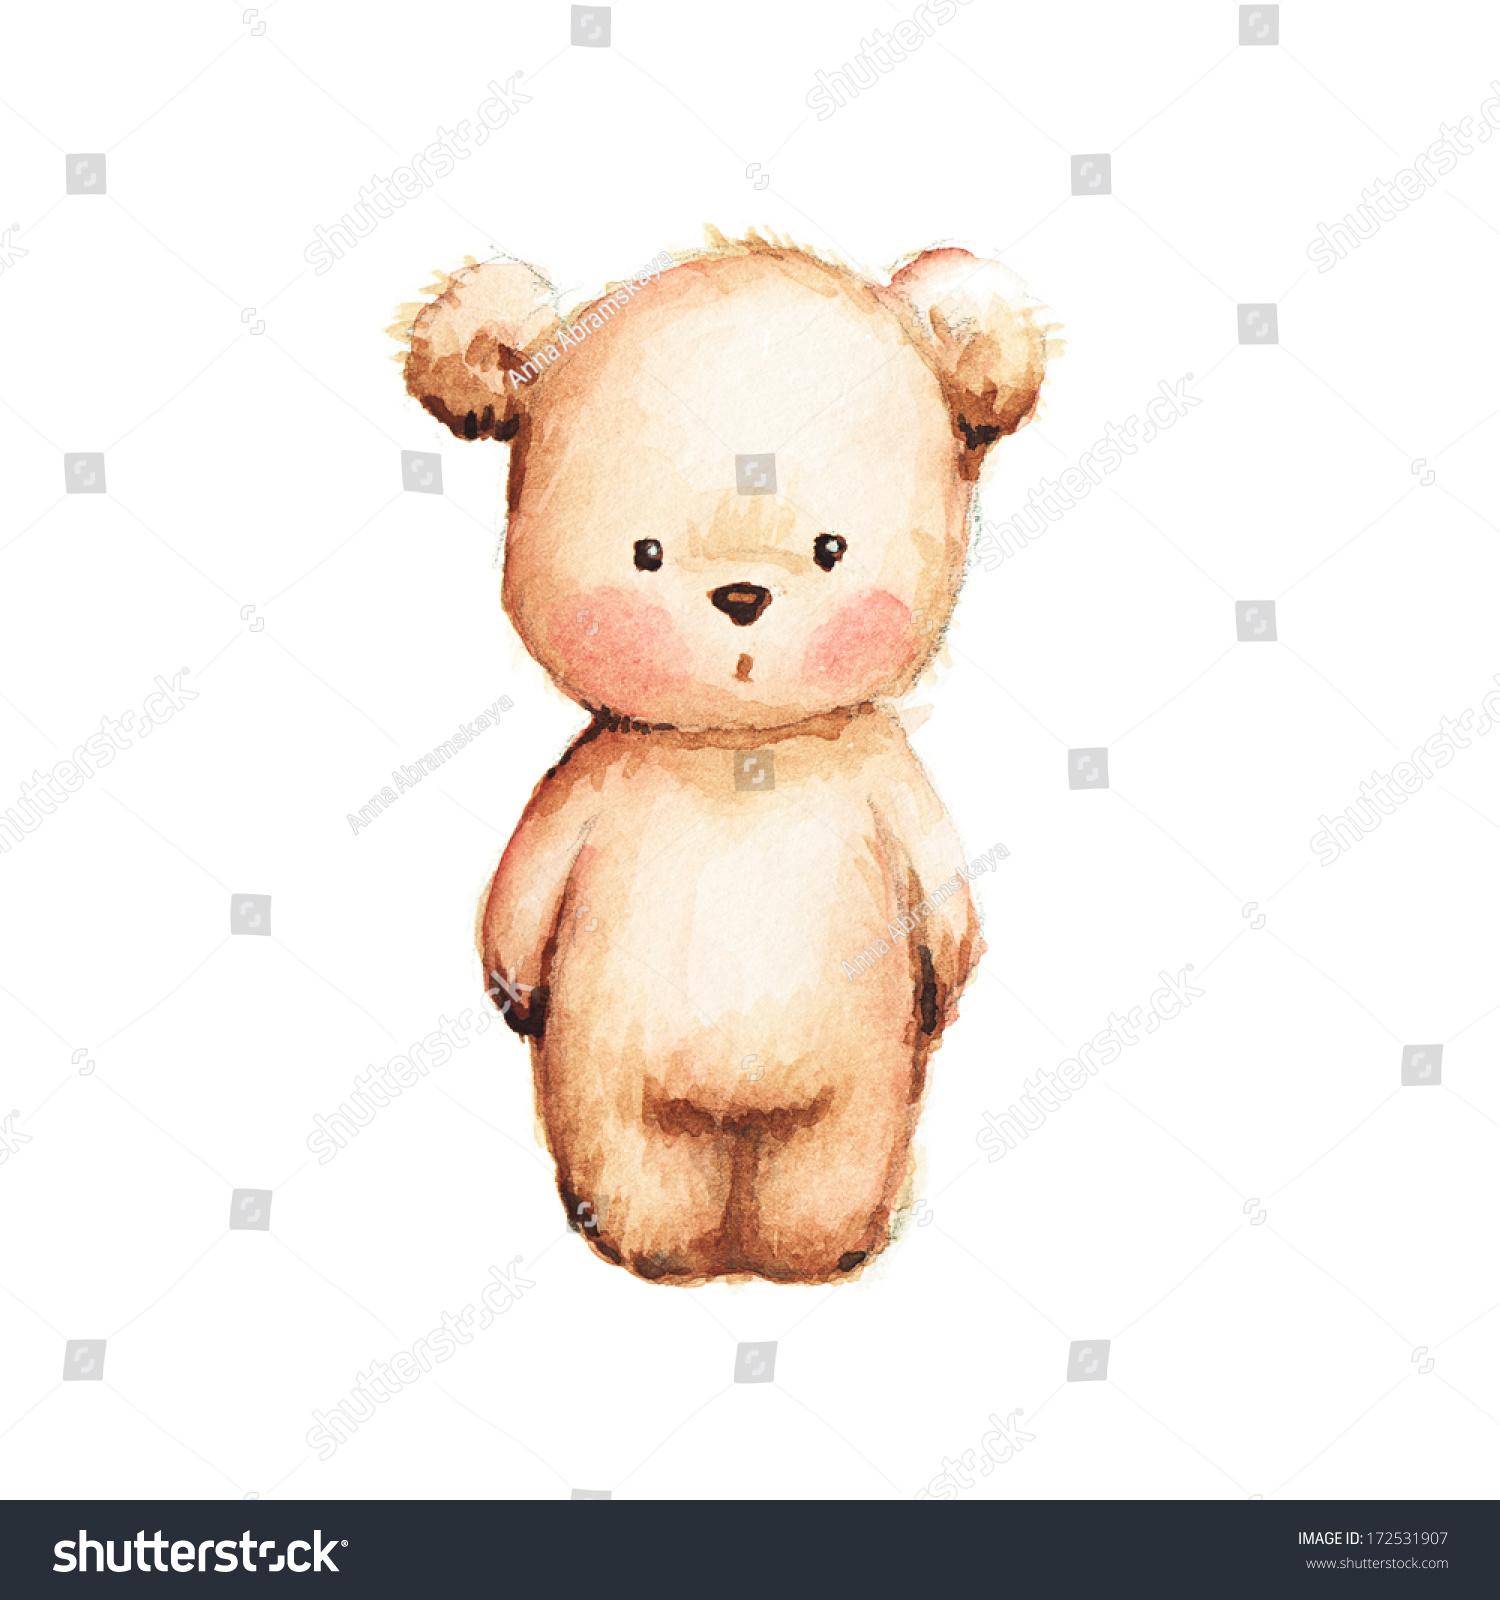 Drawing Cute Teddy Bear Stockillustration 172531907 – Shutterstock